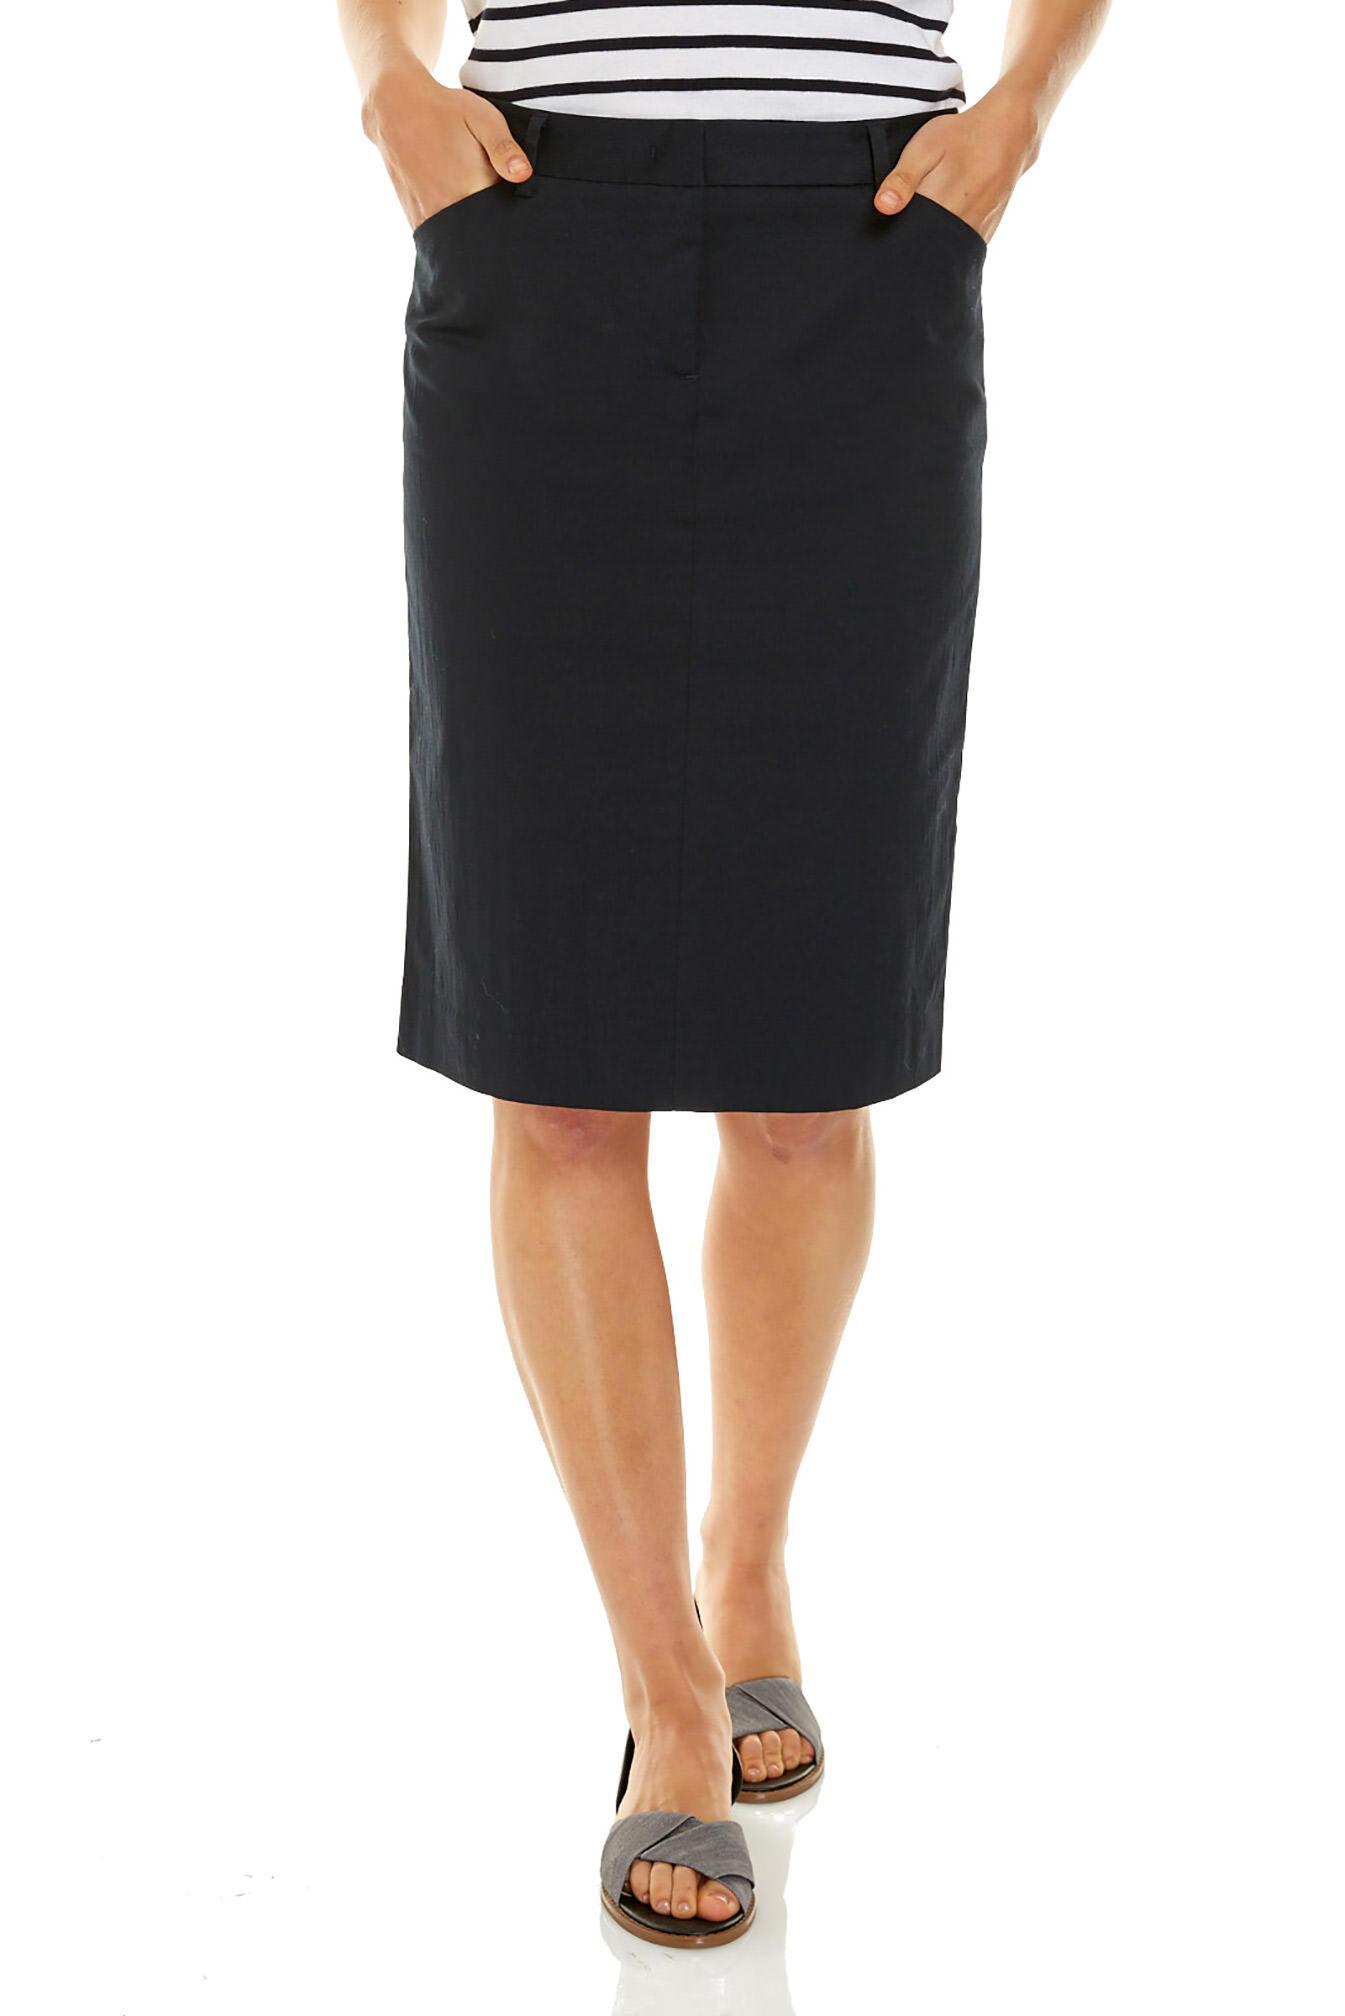 new sportscraft womens pencil skirt skirts ebay